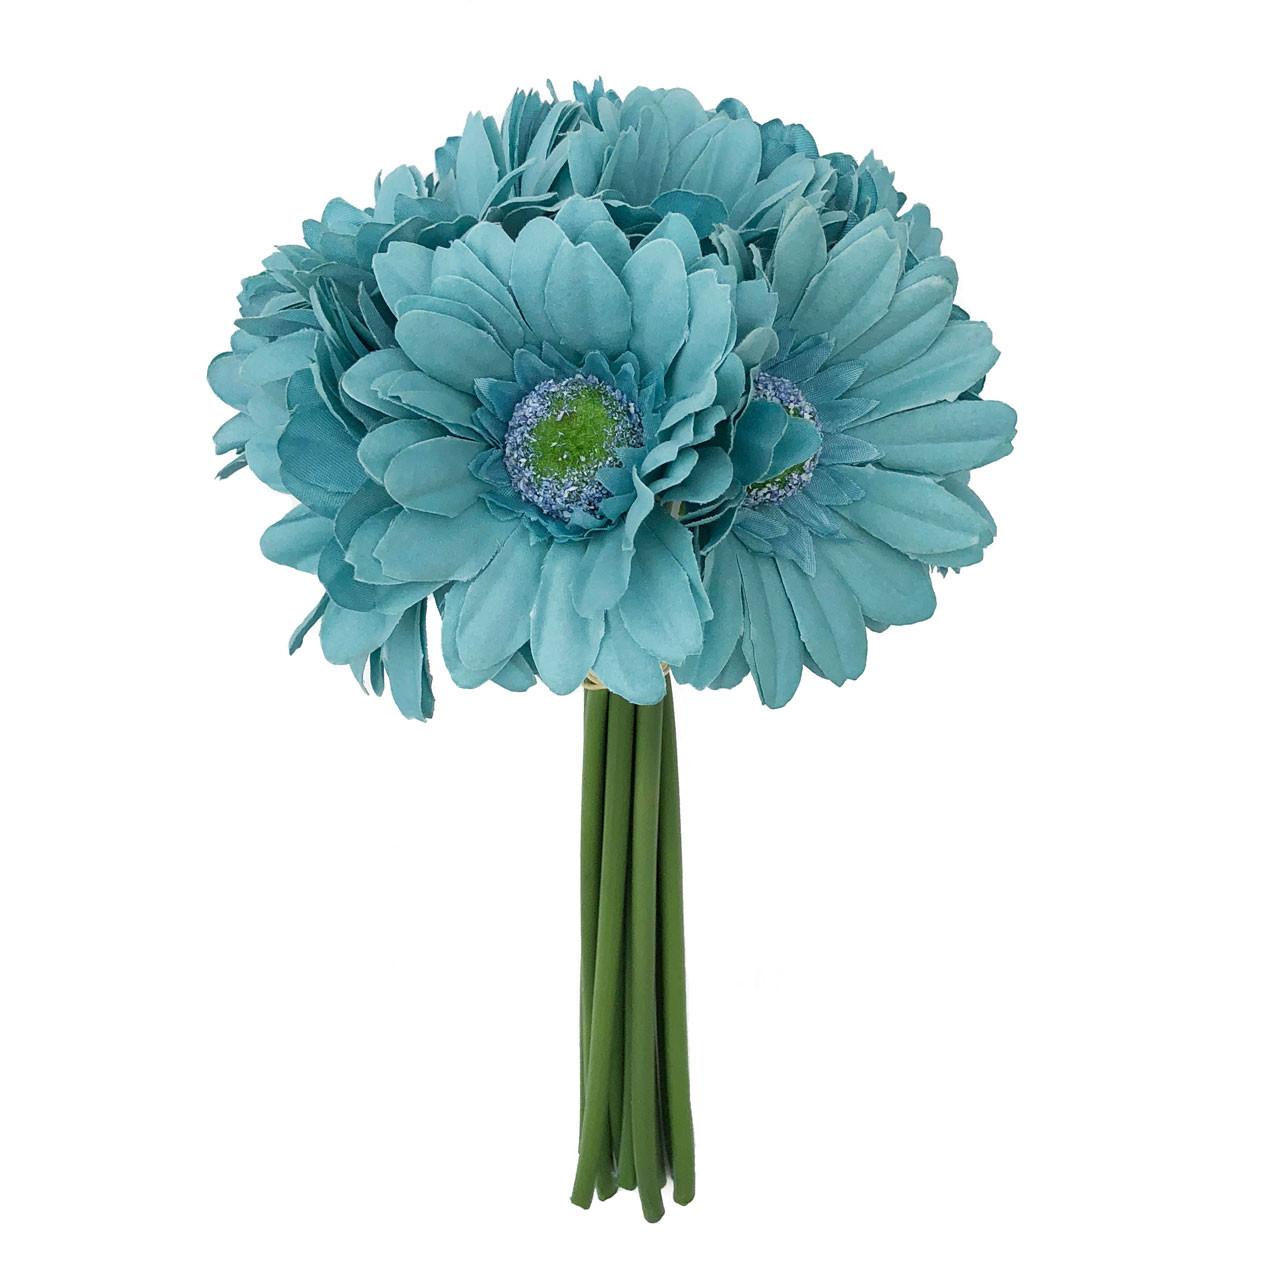 Aqua Blue Daisy Bouquet Small Silk Wedding Flowers 9 Stem